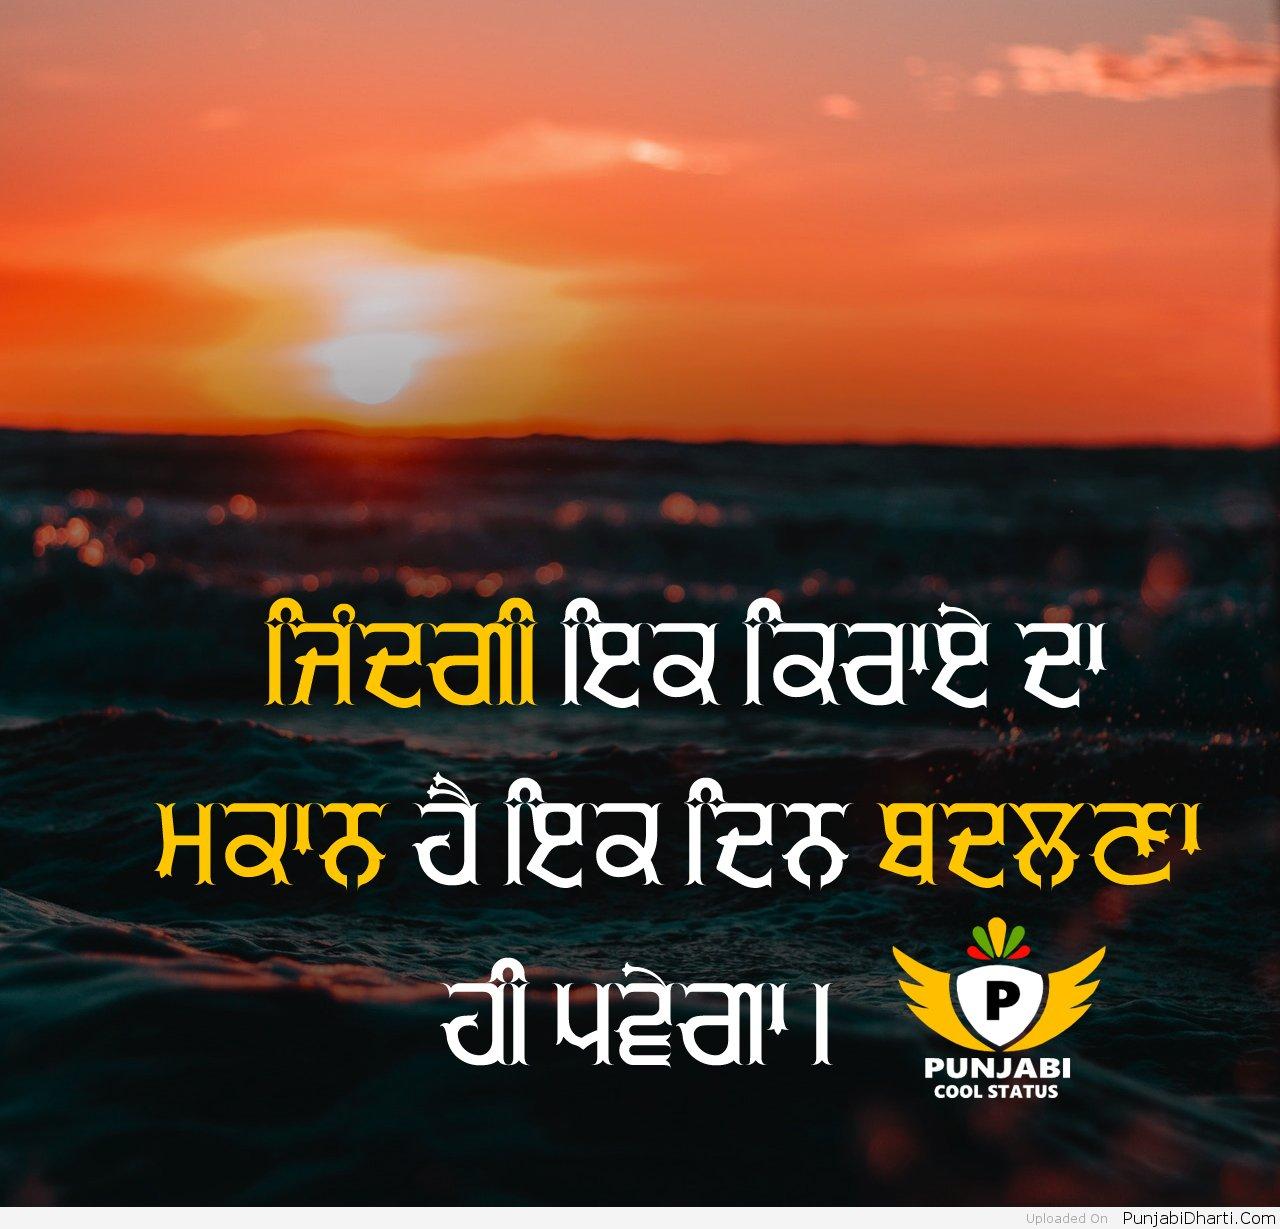 Punjabi Cool Status   PunjabiDharti.Com